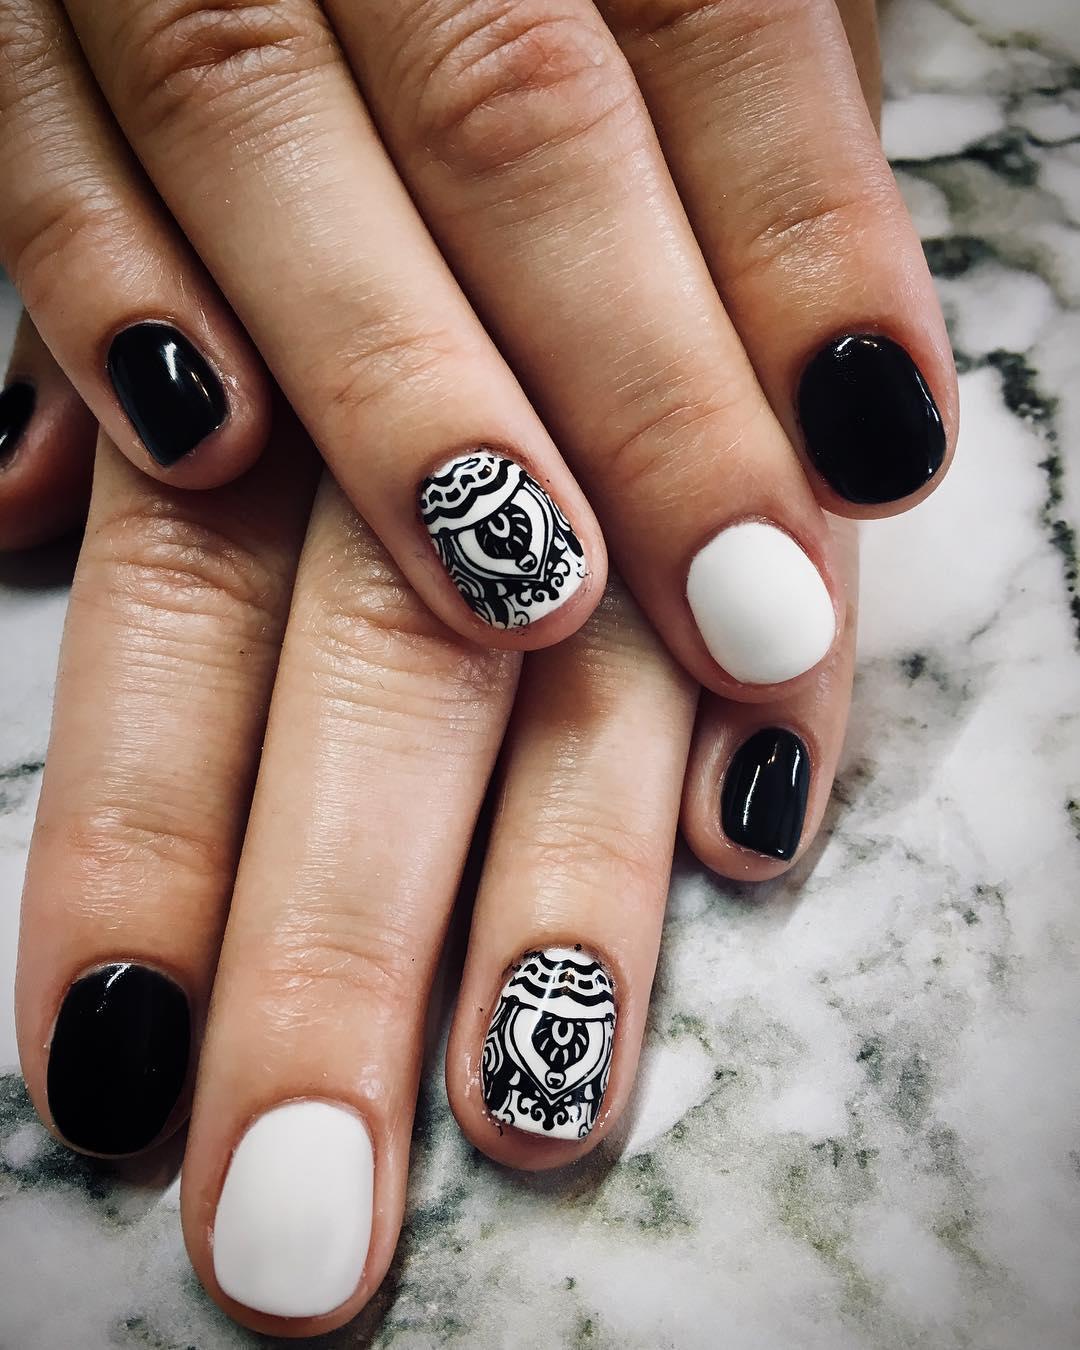 incredible black and white nail designs 10 - 16 Incredible Black and White Nail Designs